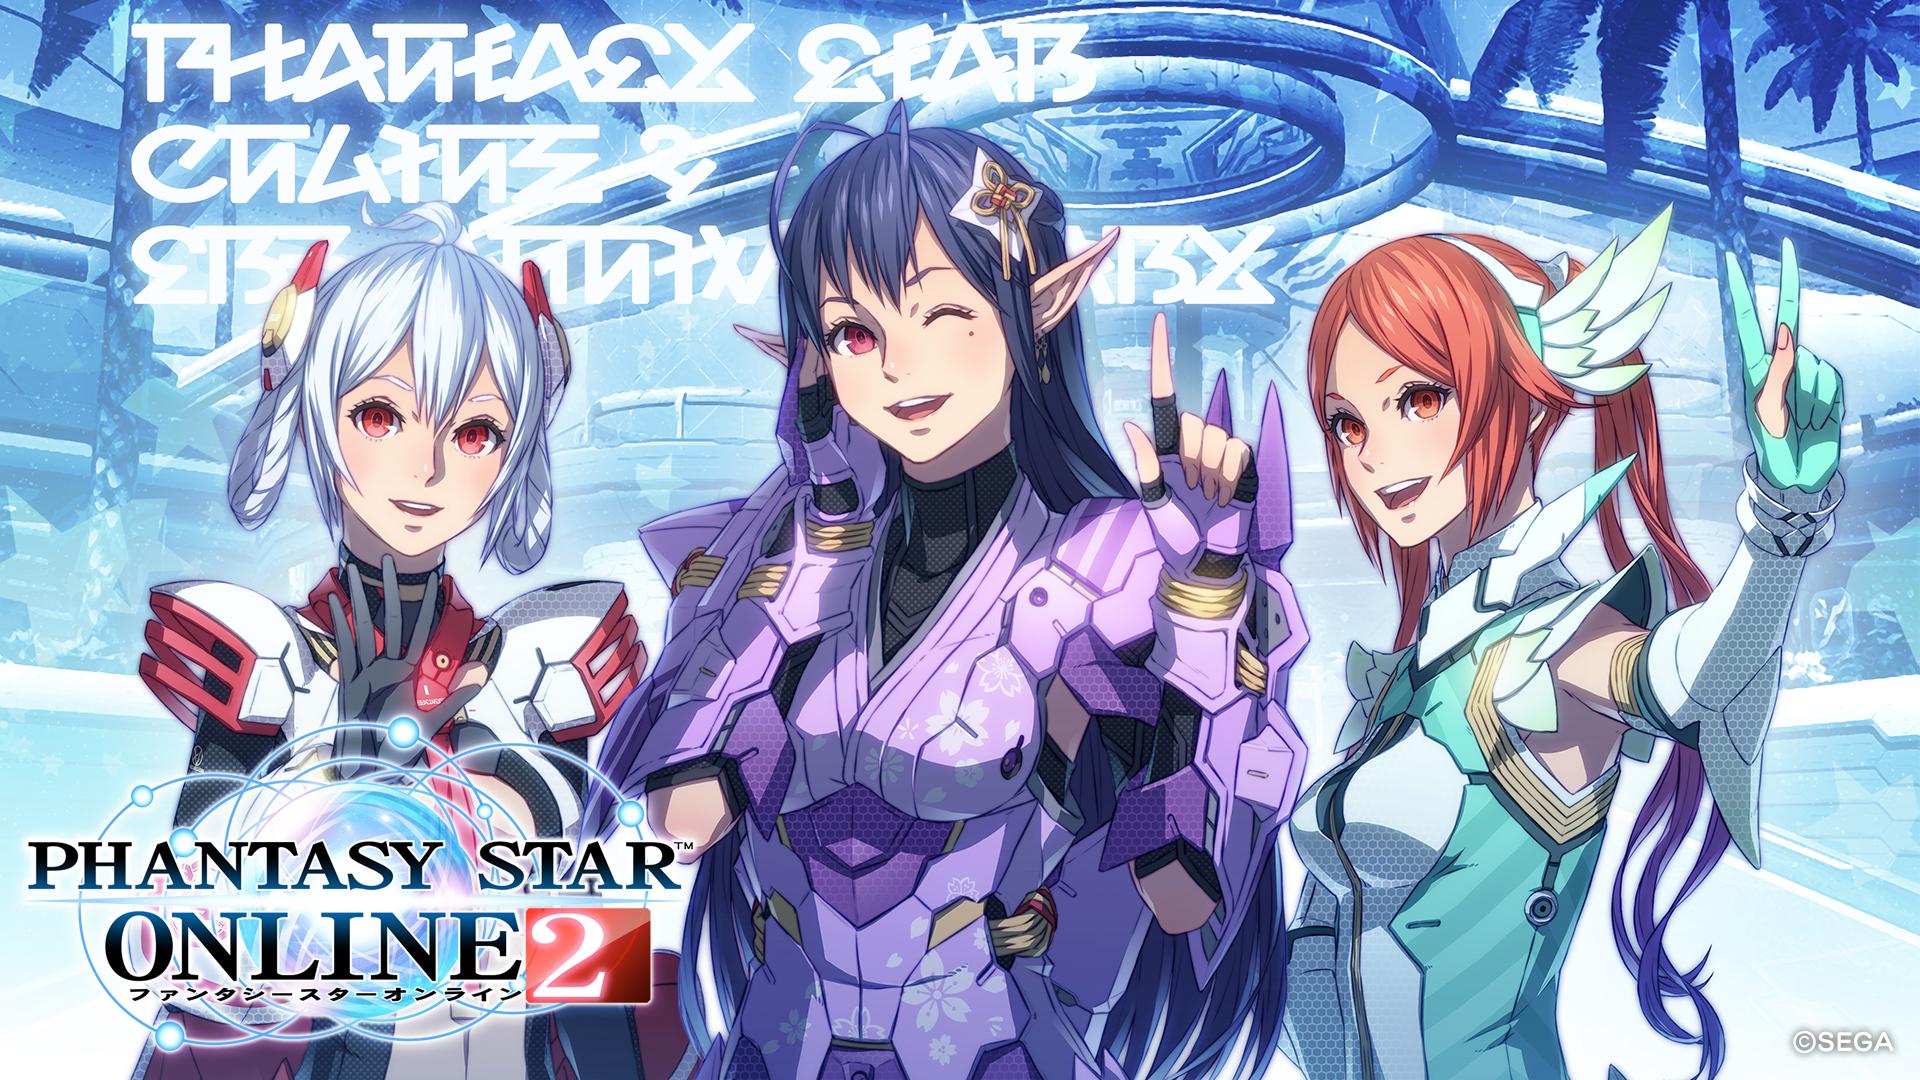 Phantasy Star Online 2 2912020 1